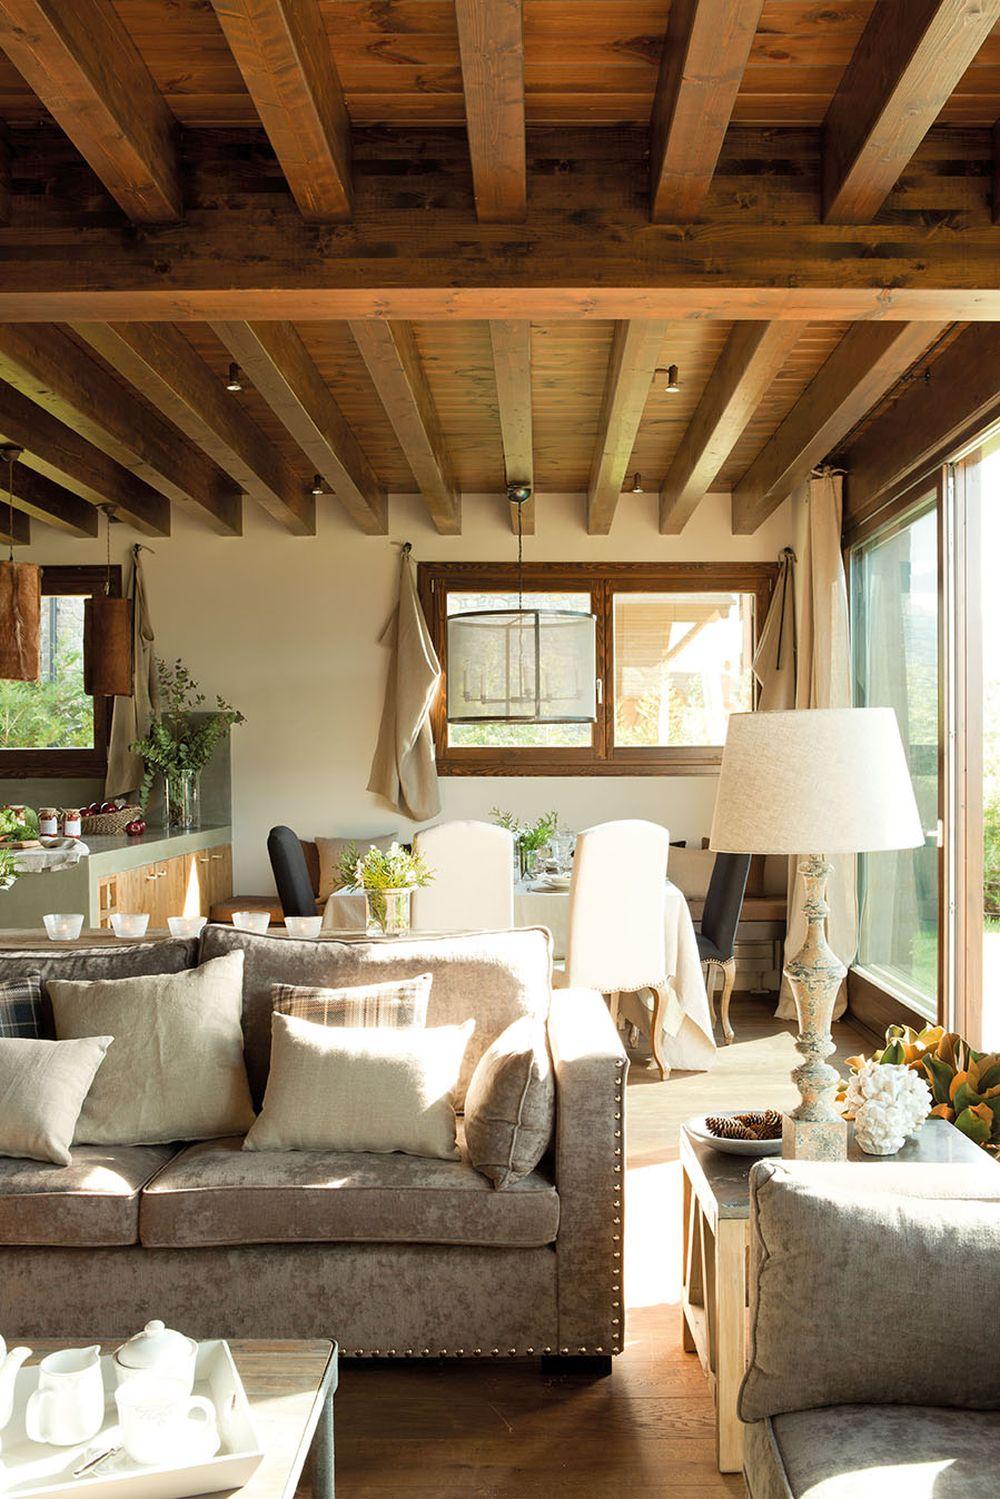 adelaparvu.com despre casa cu plafon rustic, dar amenajare urbana, designer Jeanette Trensig, Foto ElMueble (2)